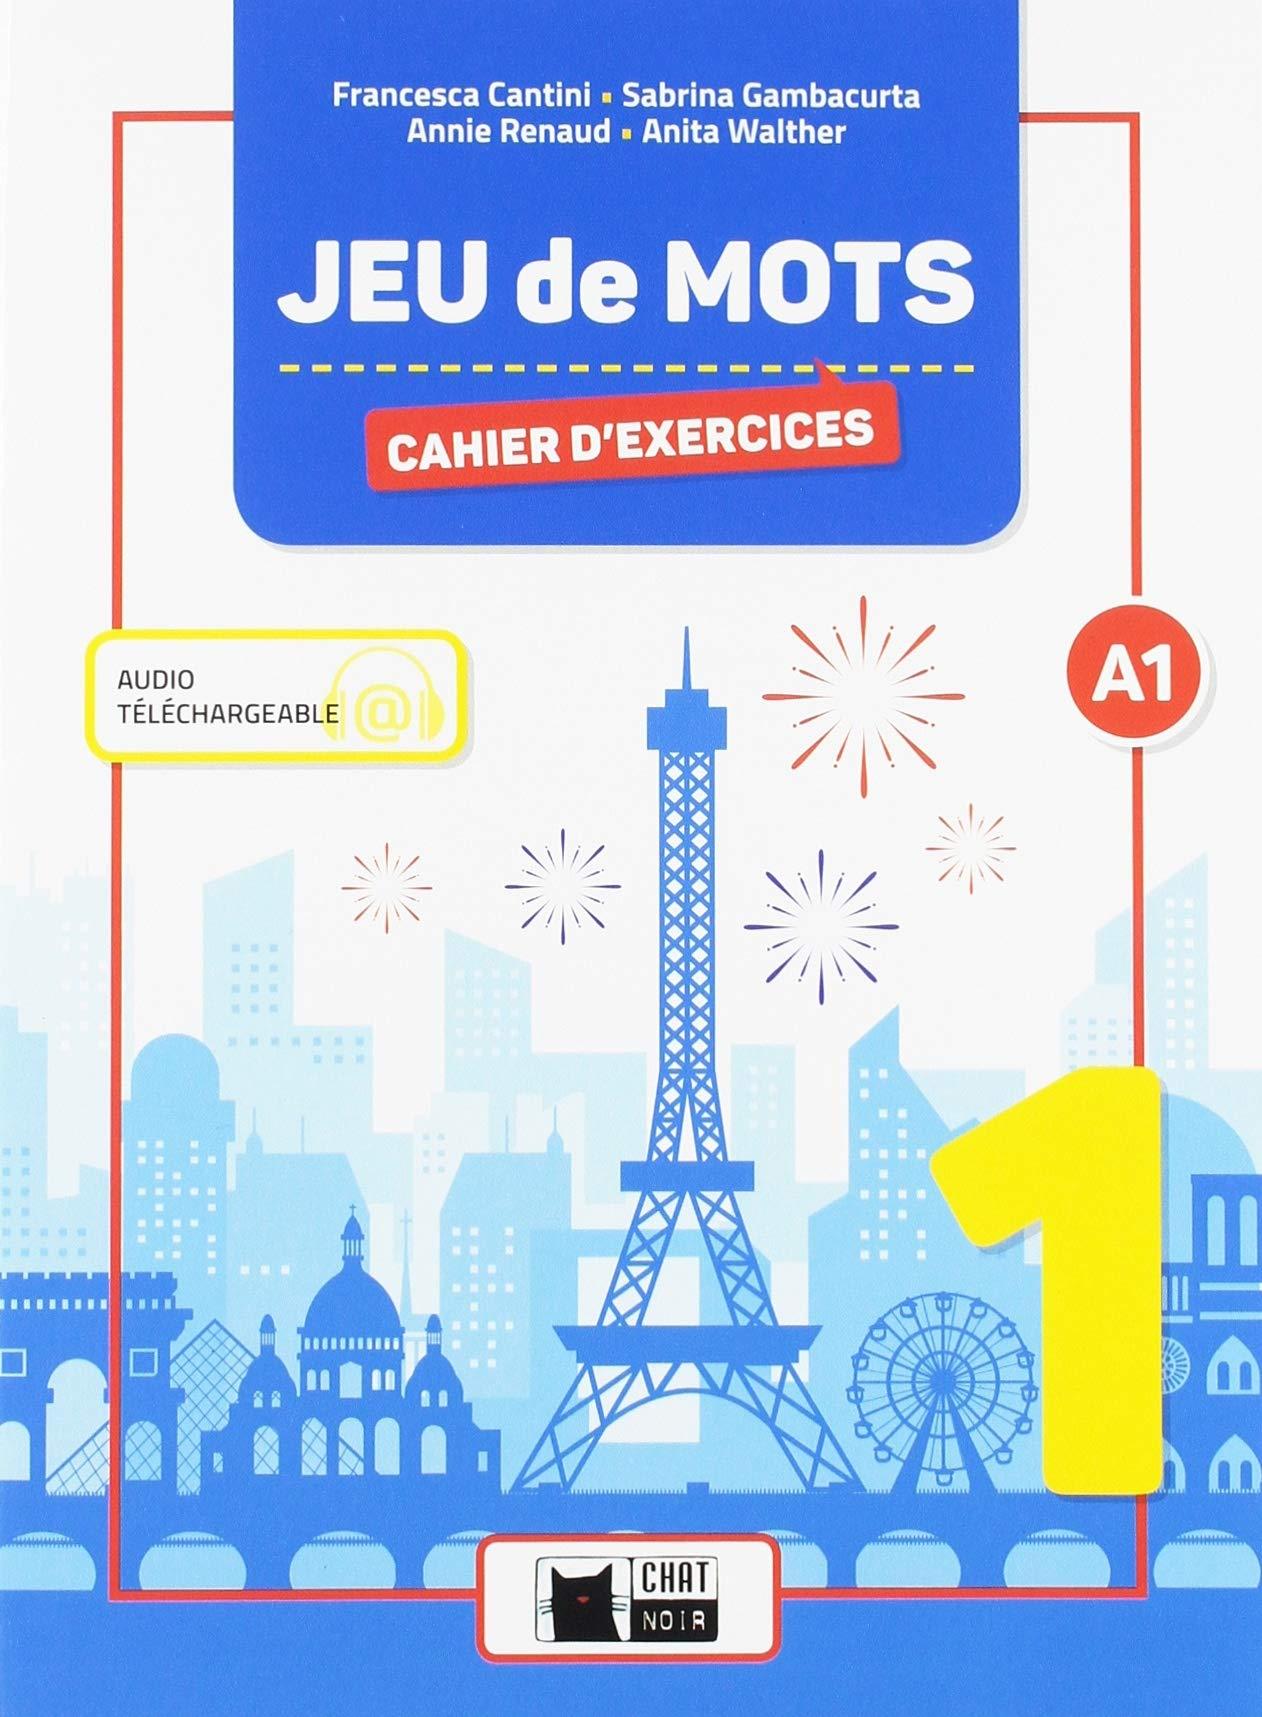 JEU DE MOTS 1 CAHIER (Cideb. Fr. Grammaire): Amazon.es: de Agostini Scuola Spa, de Agostini Libri S.p.a: Libros en idiomas extranjeros